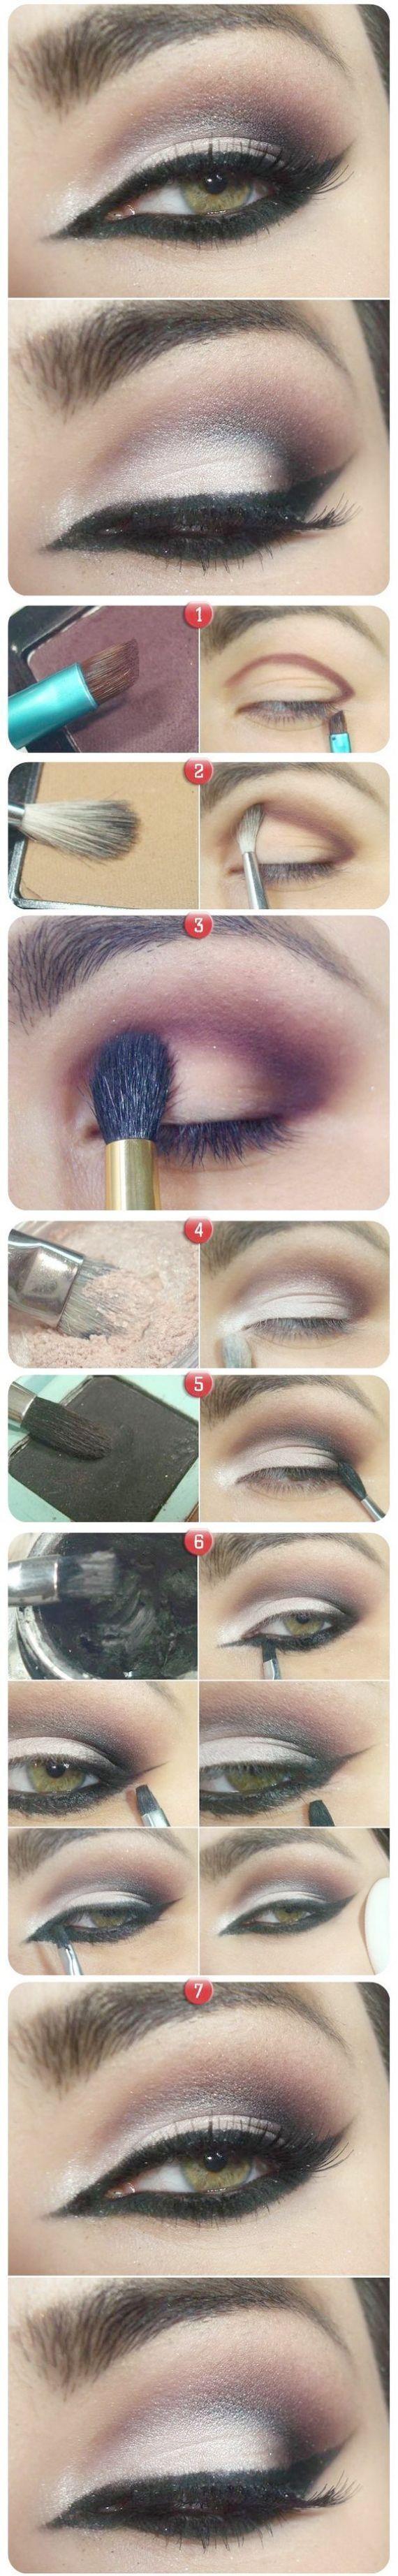 Makeup for black dress green eyes  Smokey Eye Makeup Dailymotion Eye Makeup Guide For Beginners  Eye